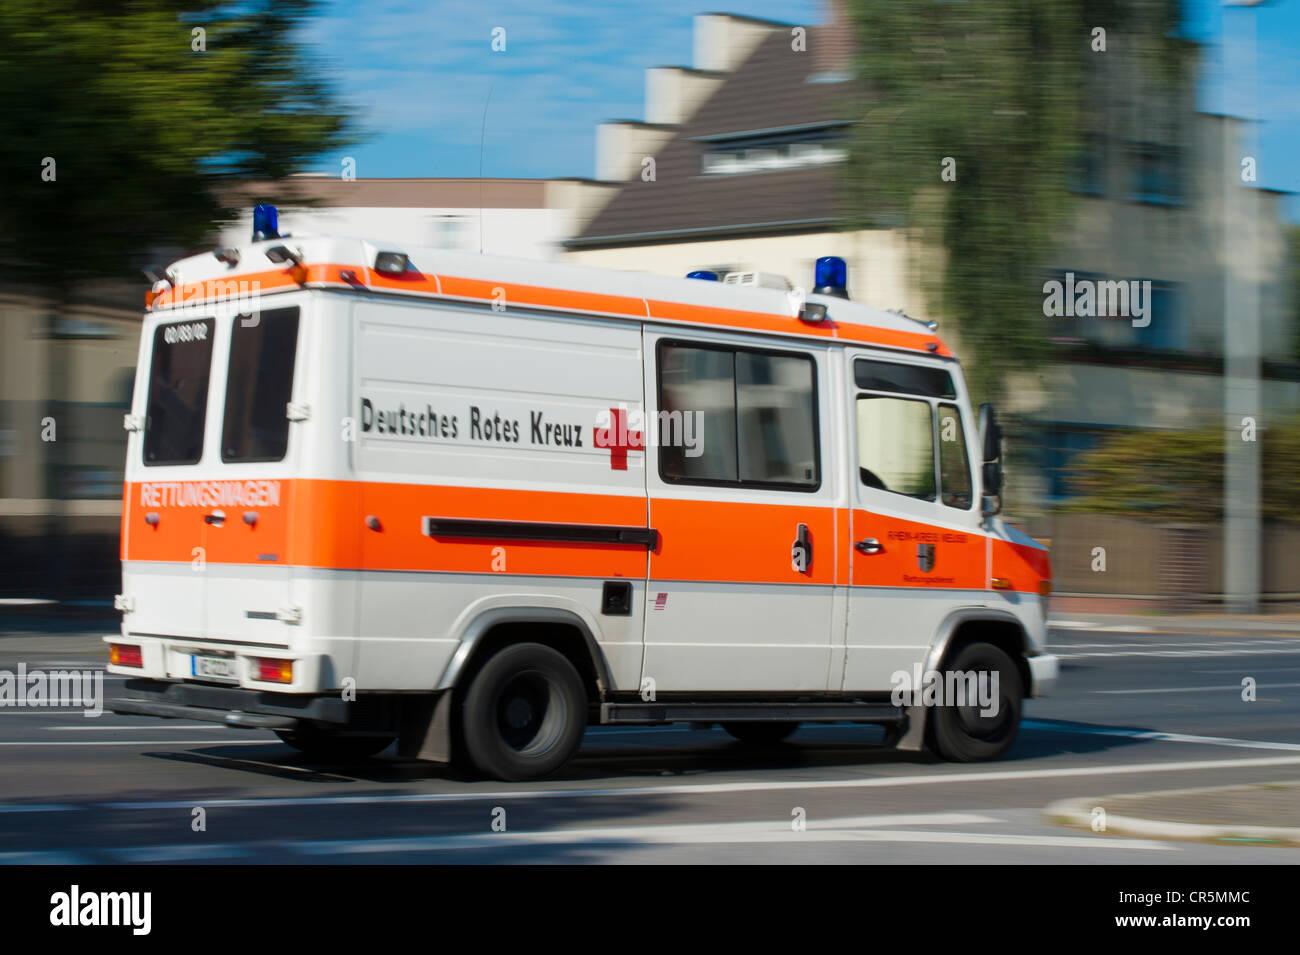 Deutsches Rotes Kreuz, German Red Cross, ambulance on an emergency call, Grevenbroich, North Rhine-Westphalia, Germany, - Stock Image